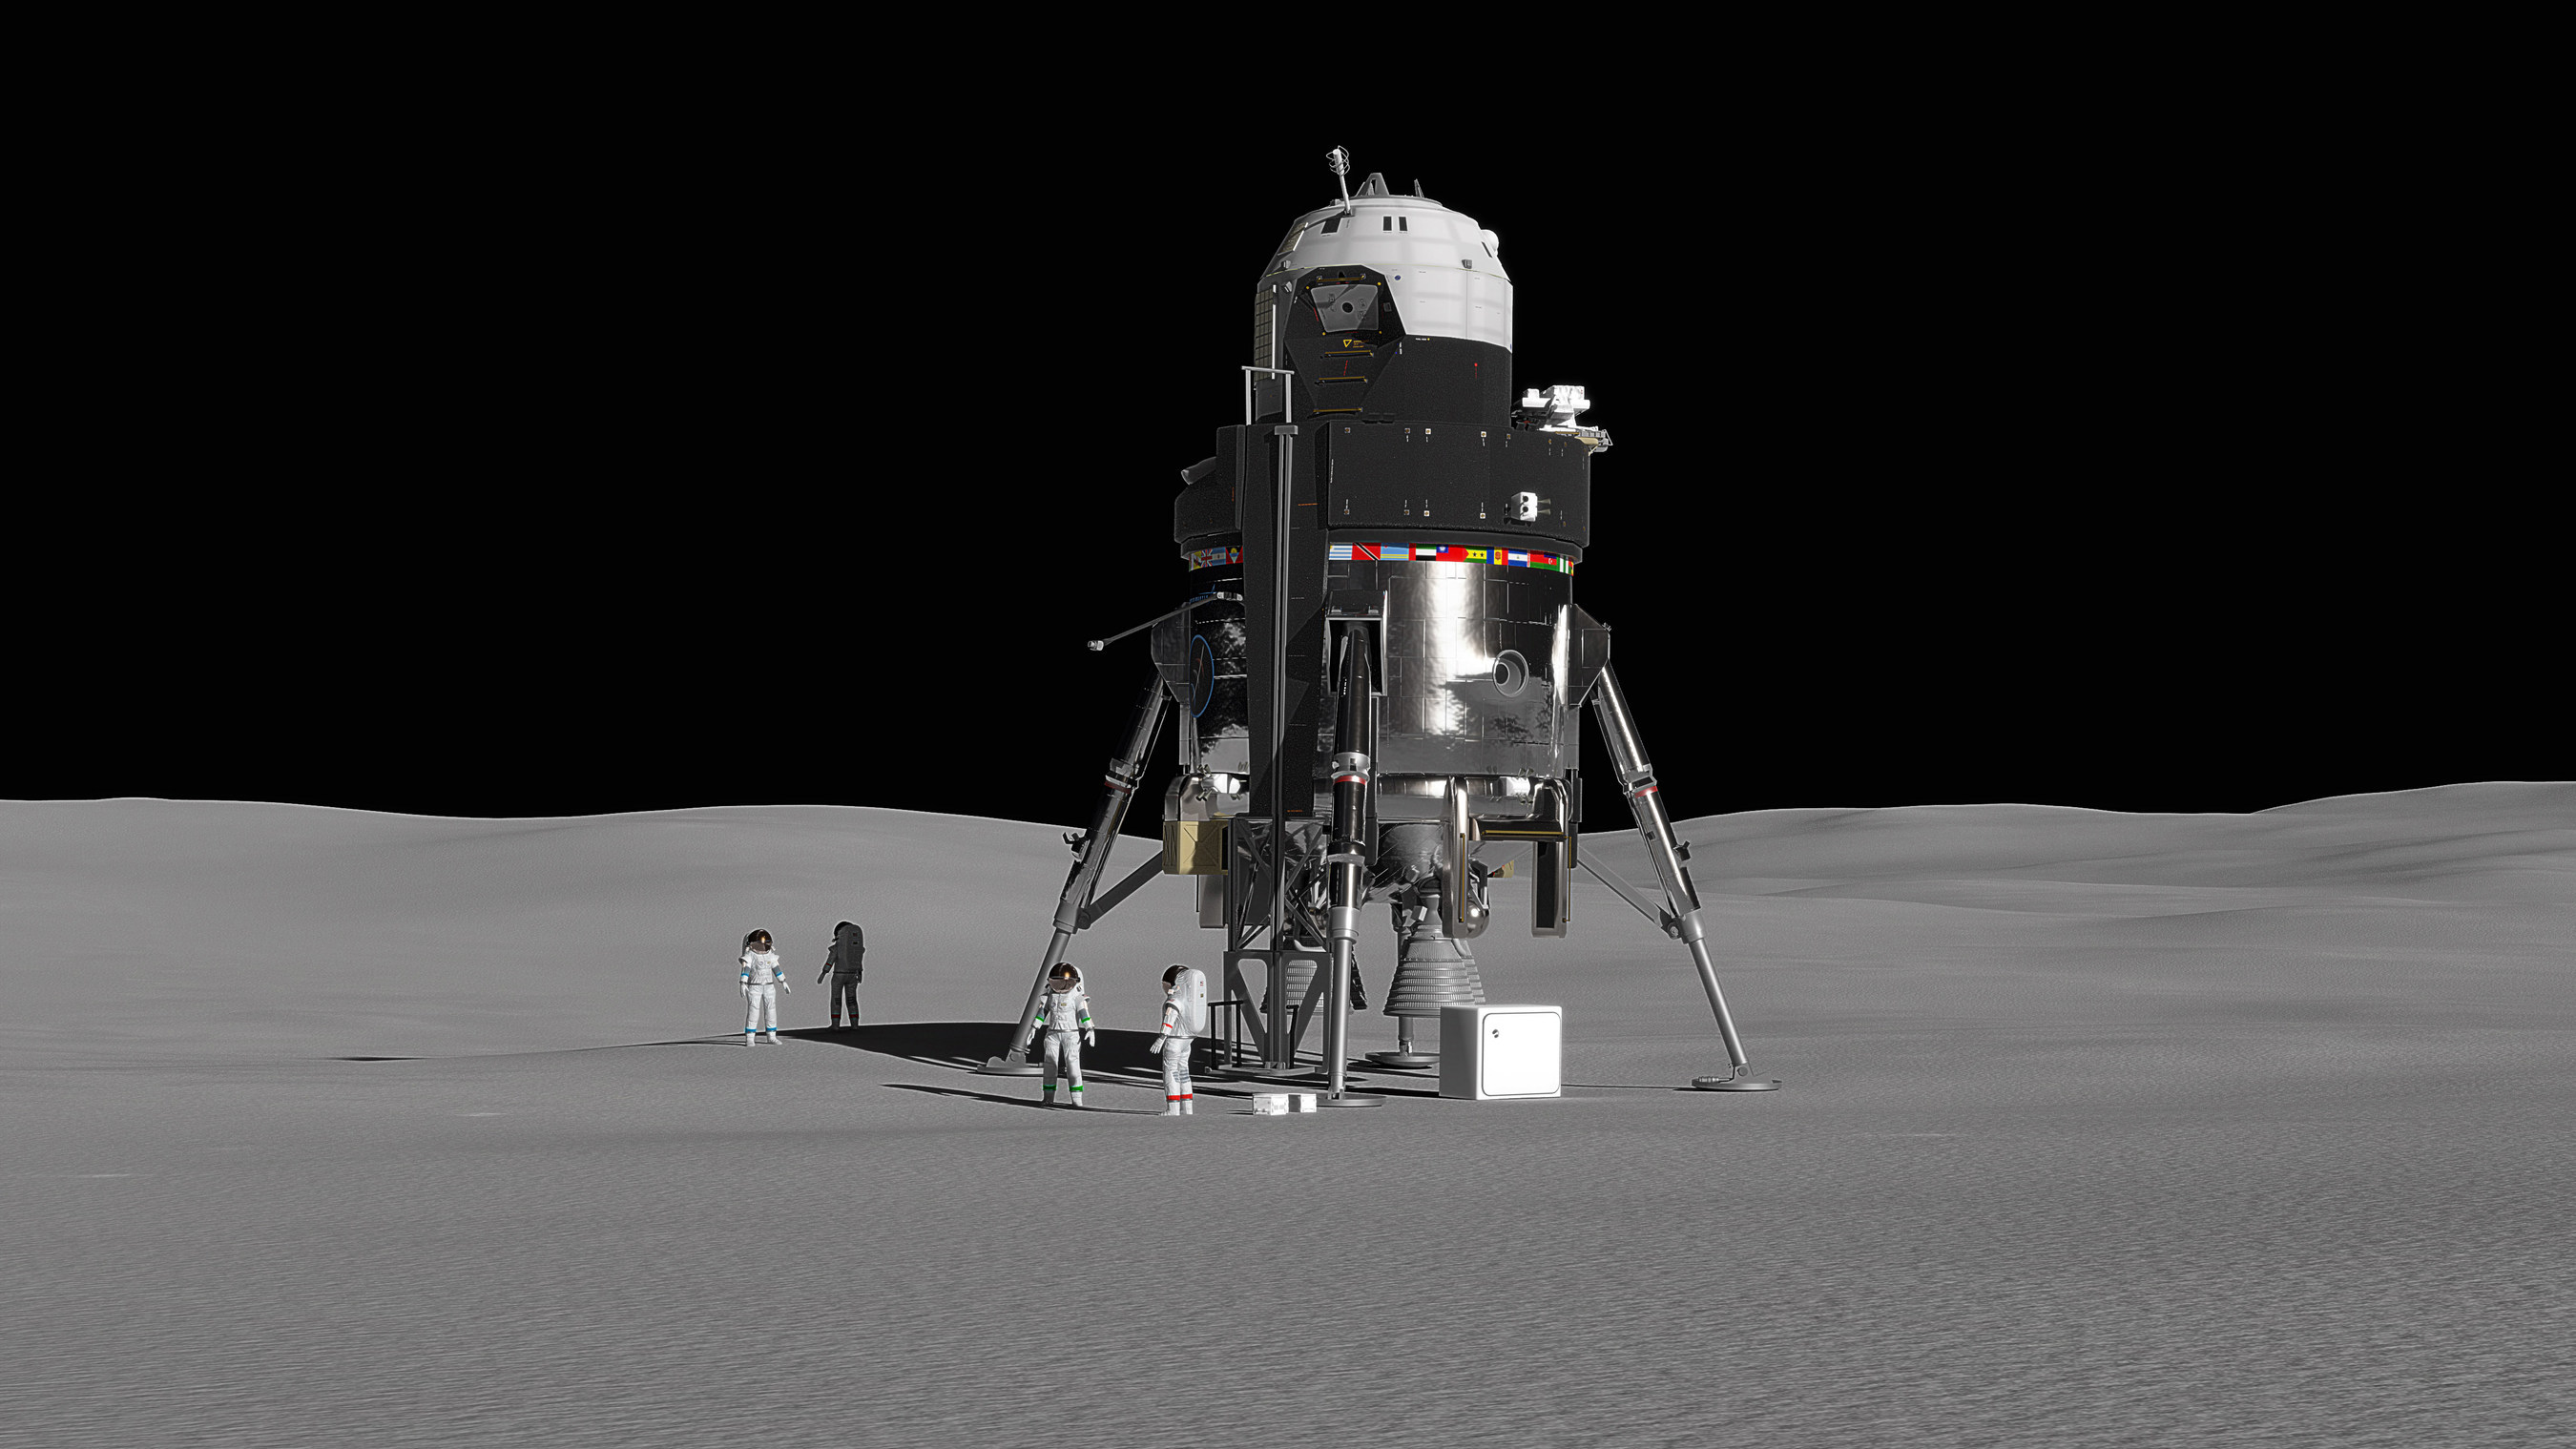 Retour vers la Lune : Esa, RosCosmos, Jaxa, Nasa, Chine, Inde 1